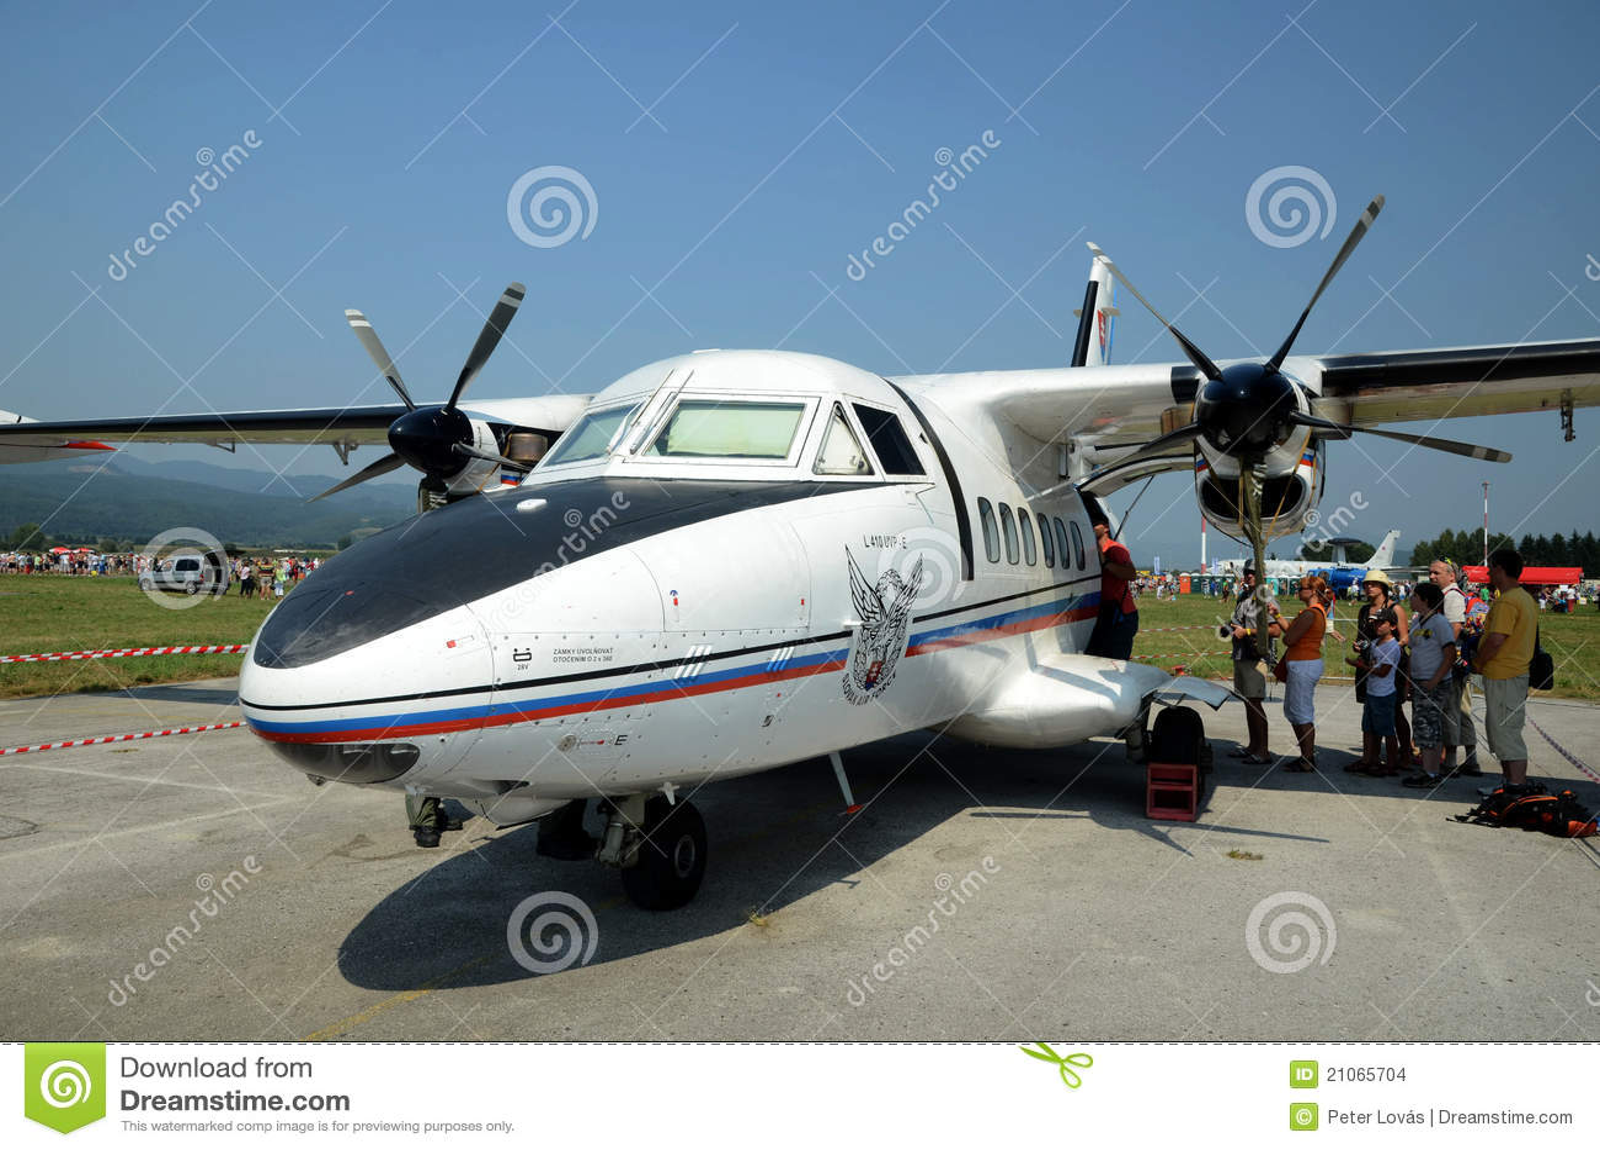 Memes Meme: WHERES YOUR PLANE PEASANTS? Lf L Owned a Plane L Admit ...